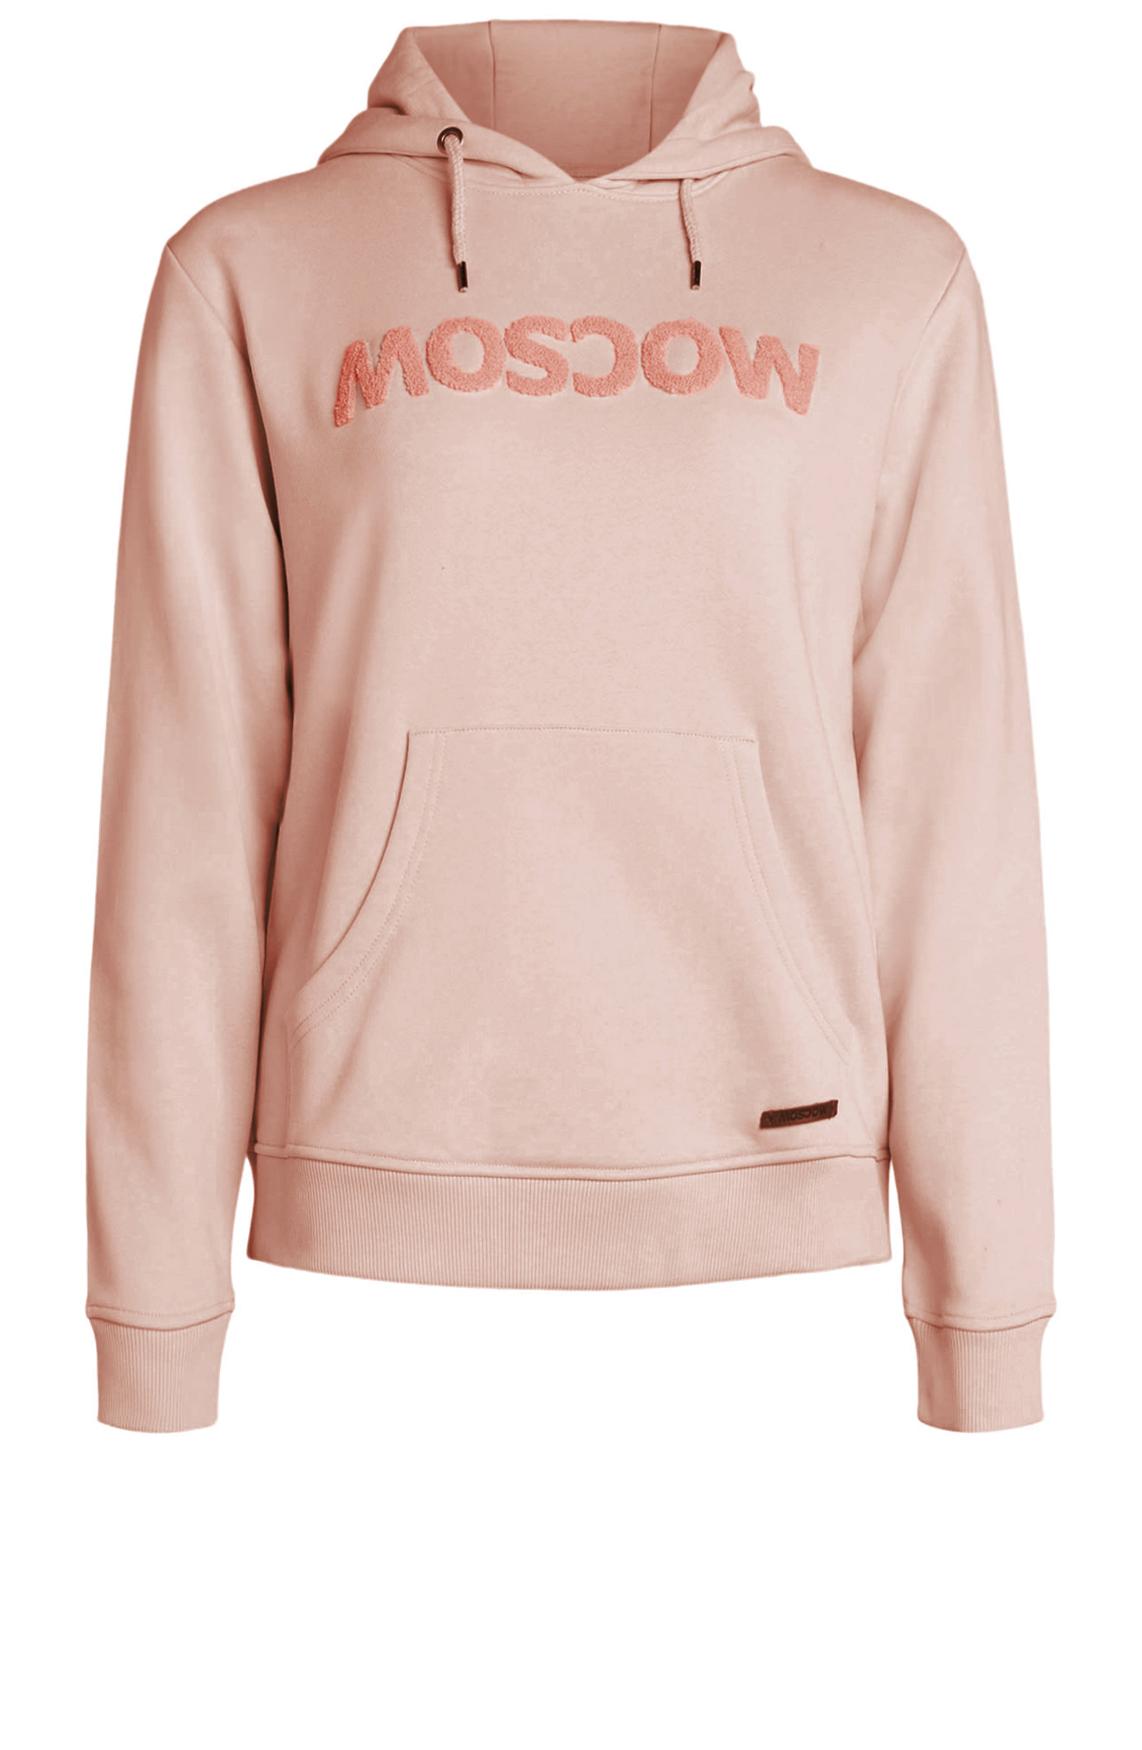 Moscow Dames Trui met capuchon roze